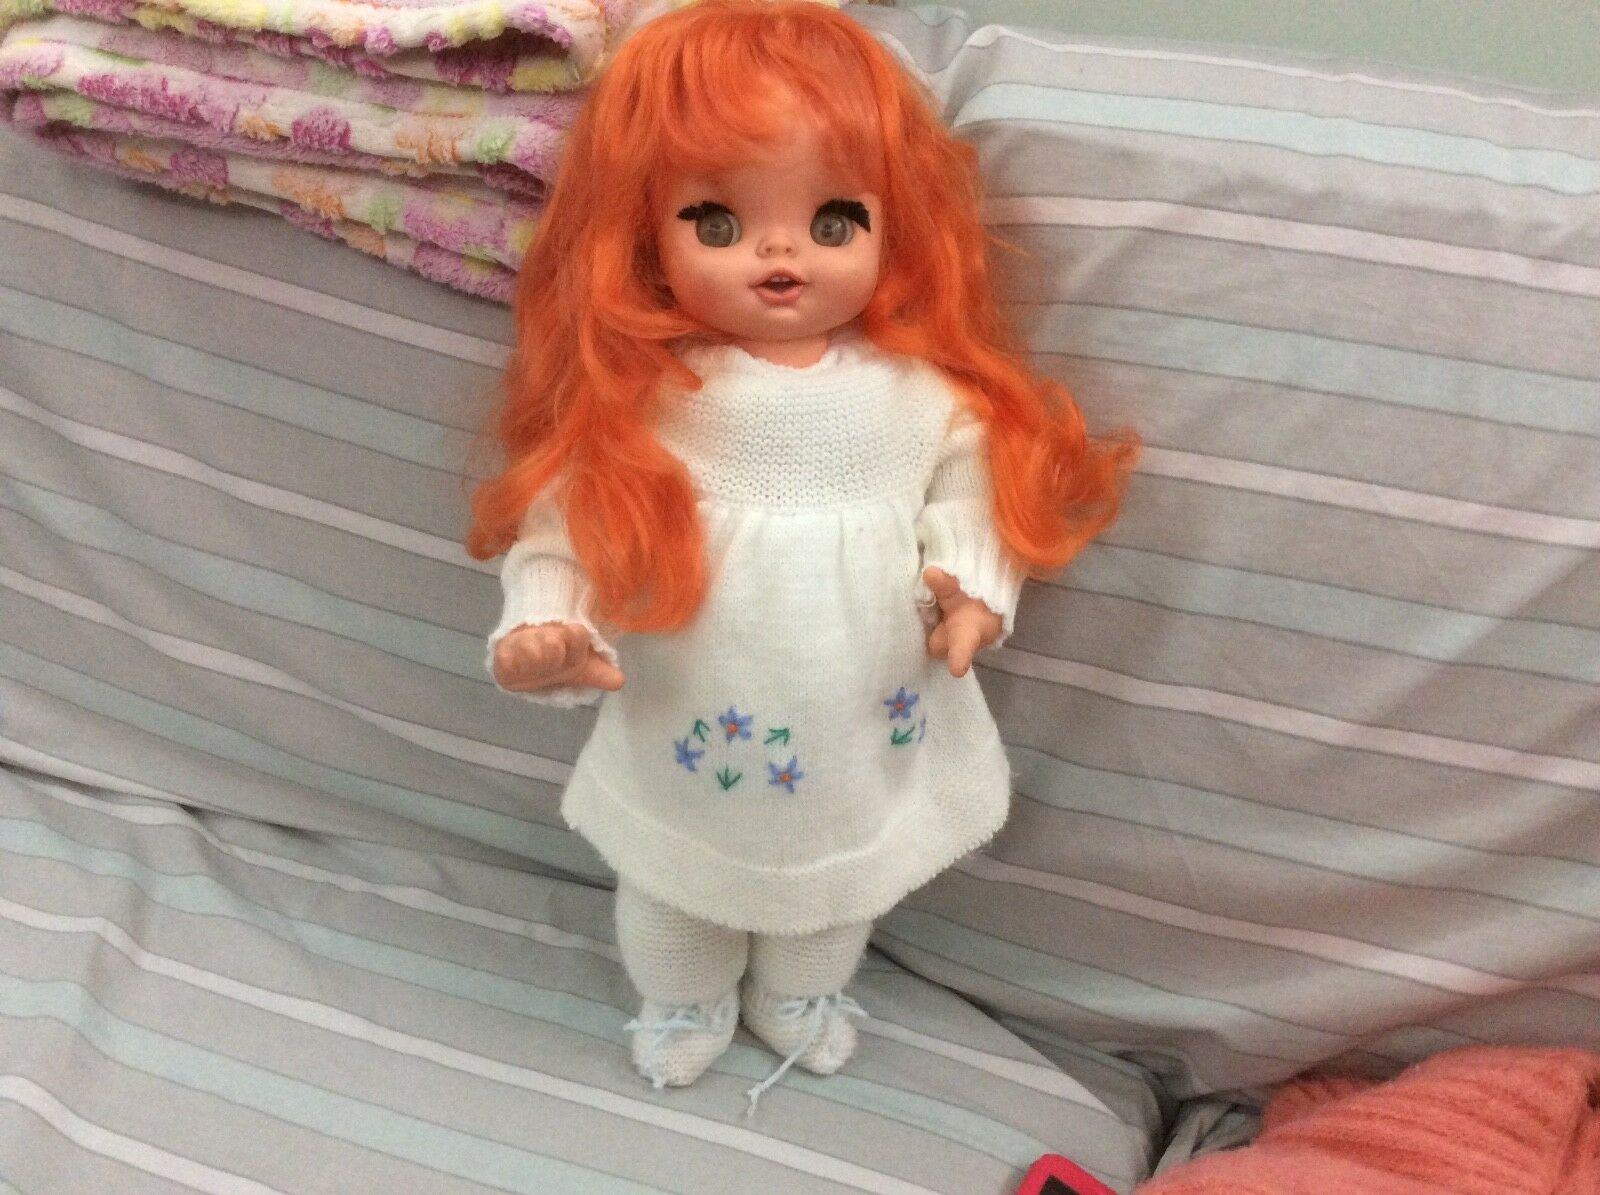 Furga Arabella capelli rossi soffici bambola vintage Doll bellissima anni 60